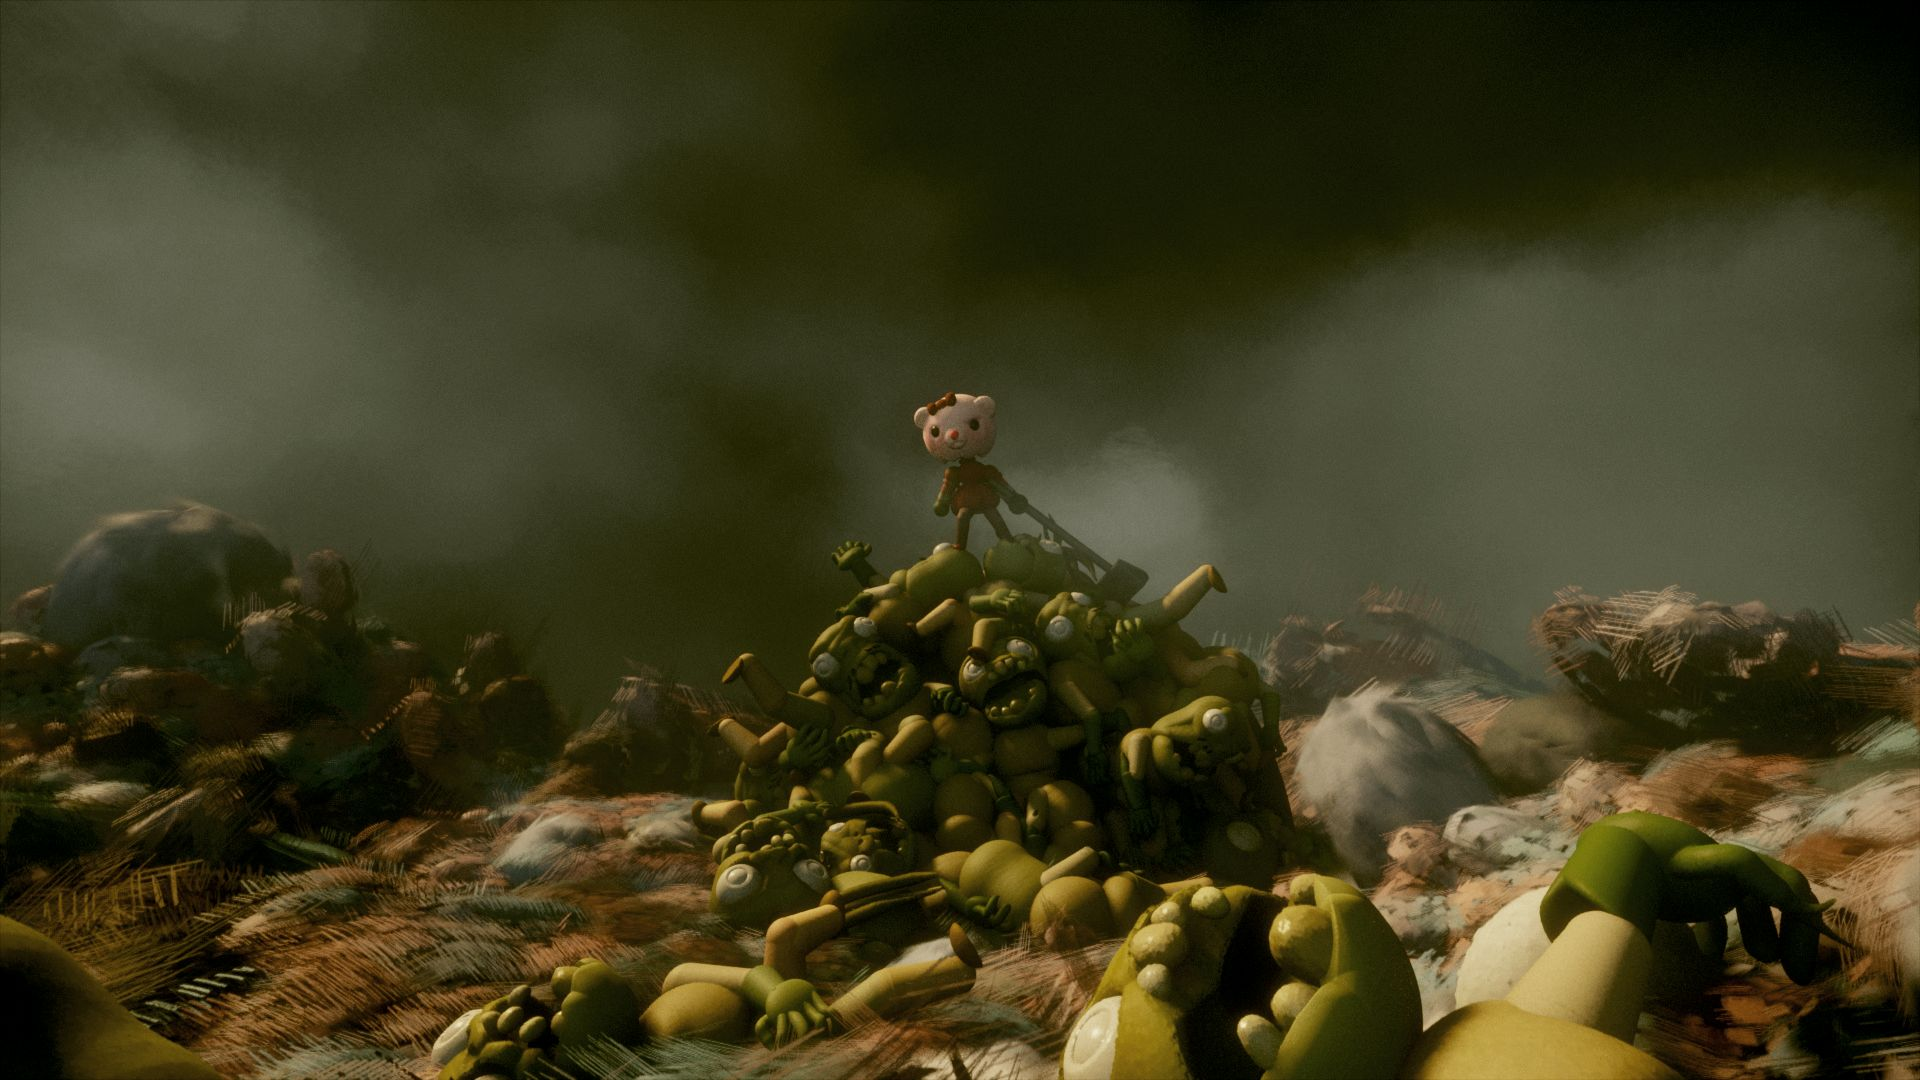 Galerie: Horizon, Uncharted 4, Last Guardian, Until Dawn 110306